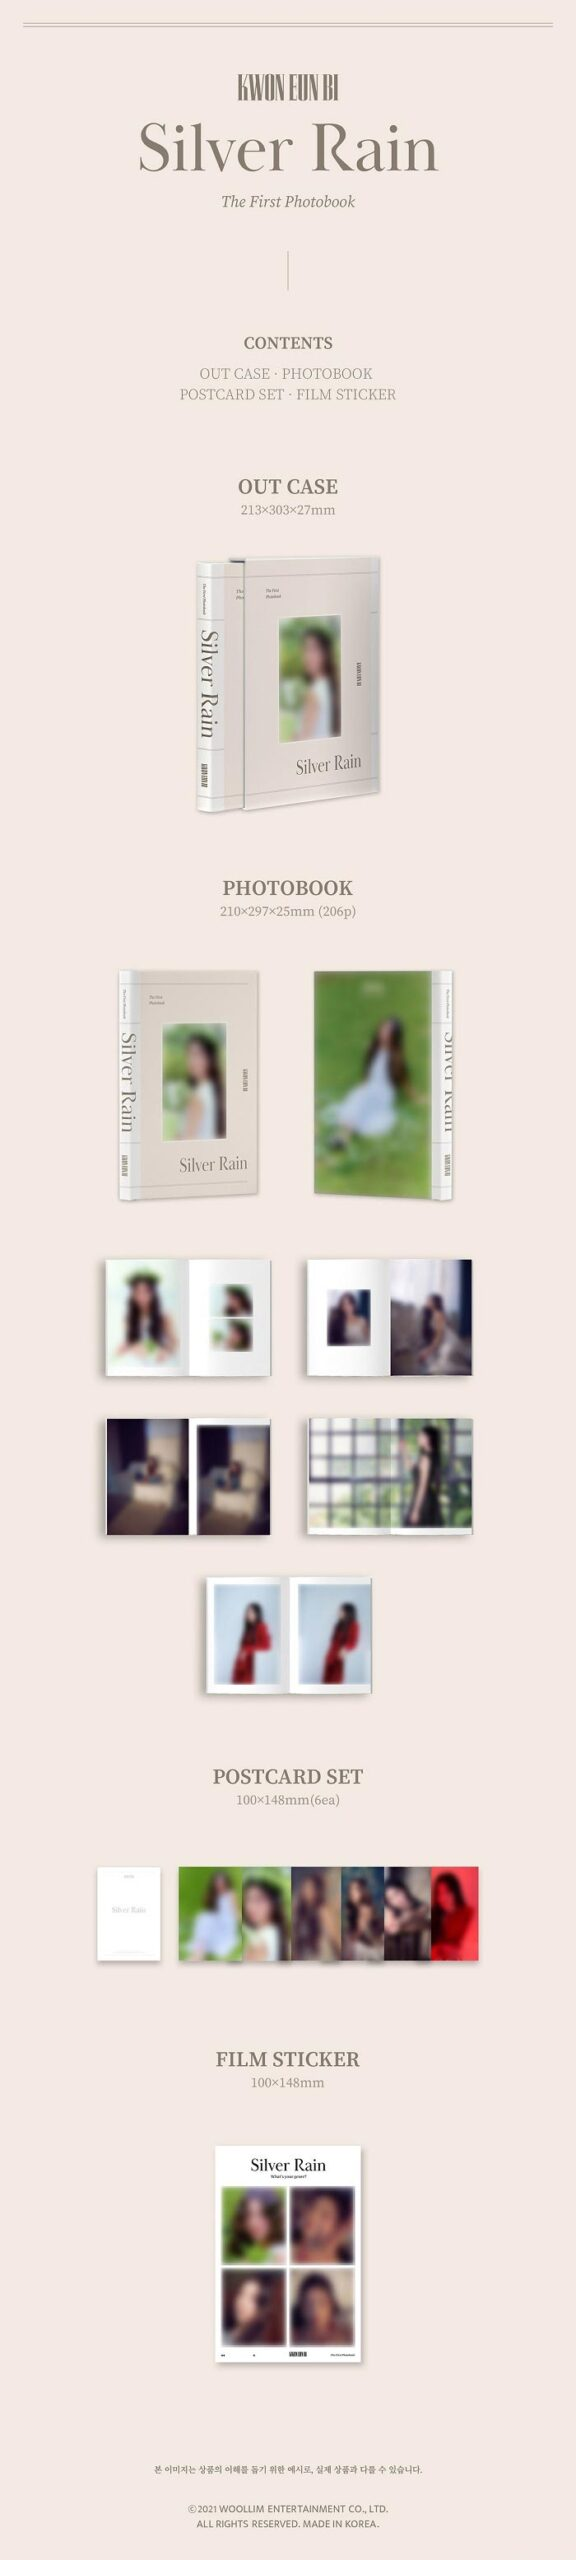 KWON EUN BI IZONE The First Photobook Silver Rain